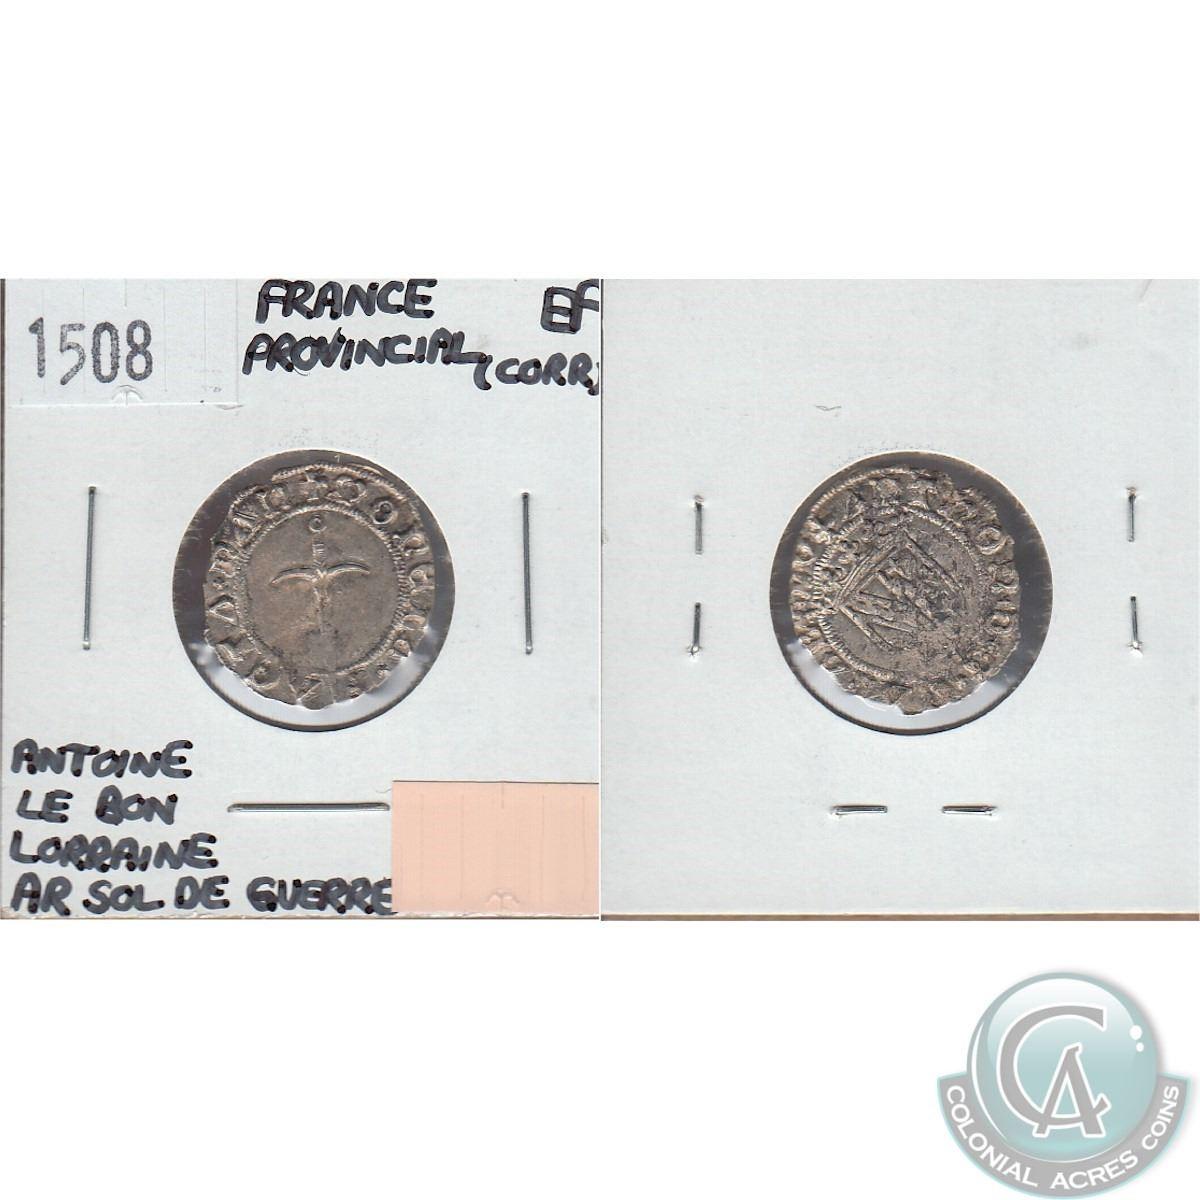 1508 France Provencial Antoine Le Bon Lorraine Ar Sol De Guerre Coin In Extra Fine Condition Sctrat